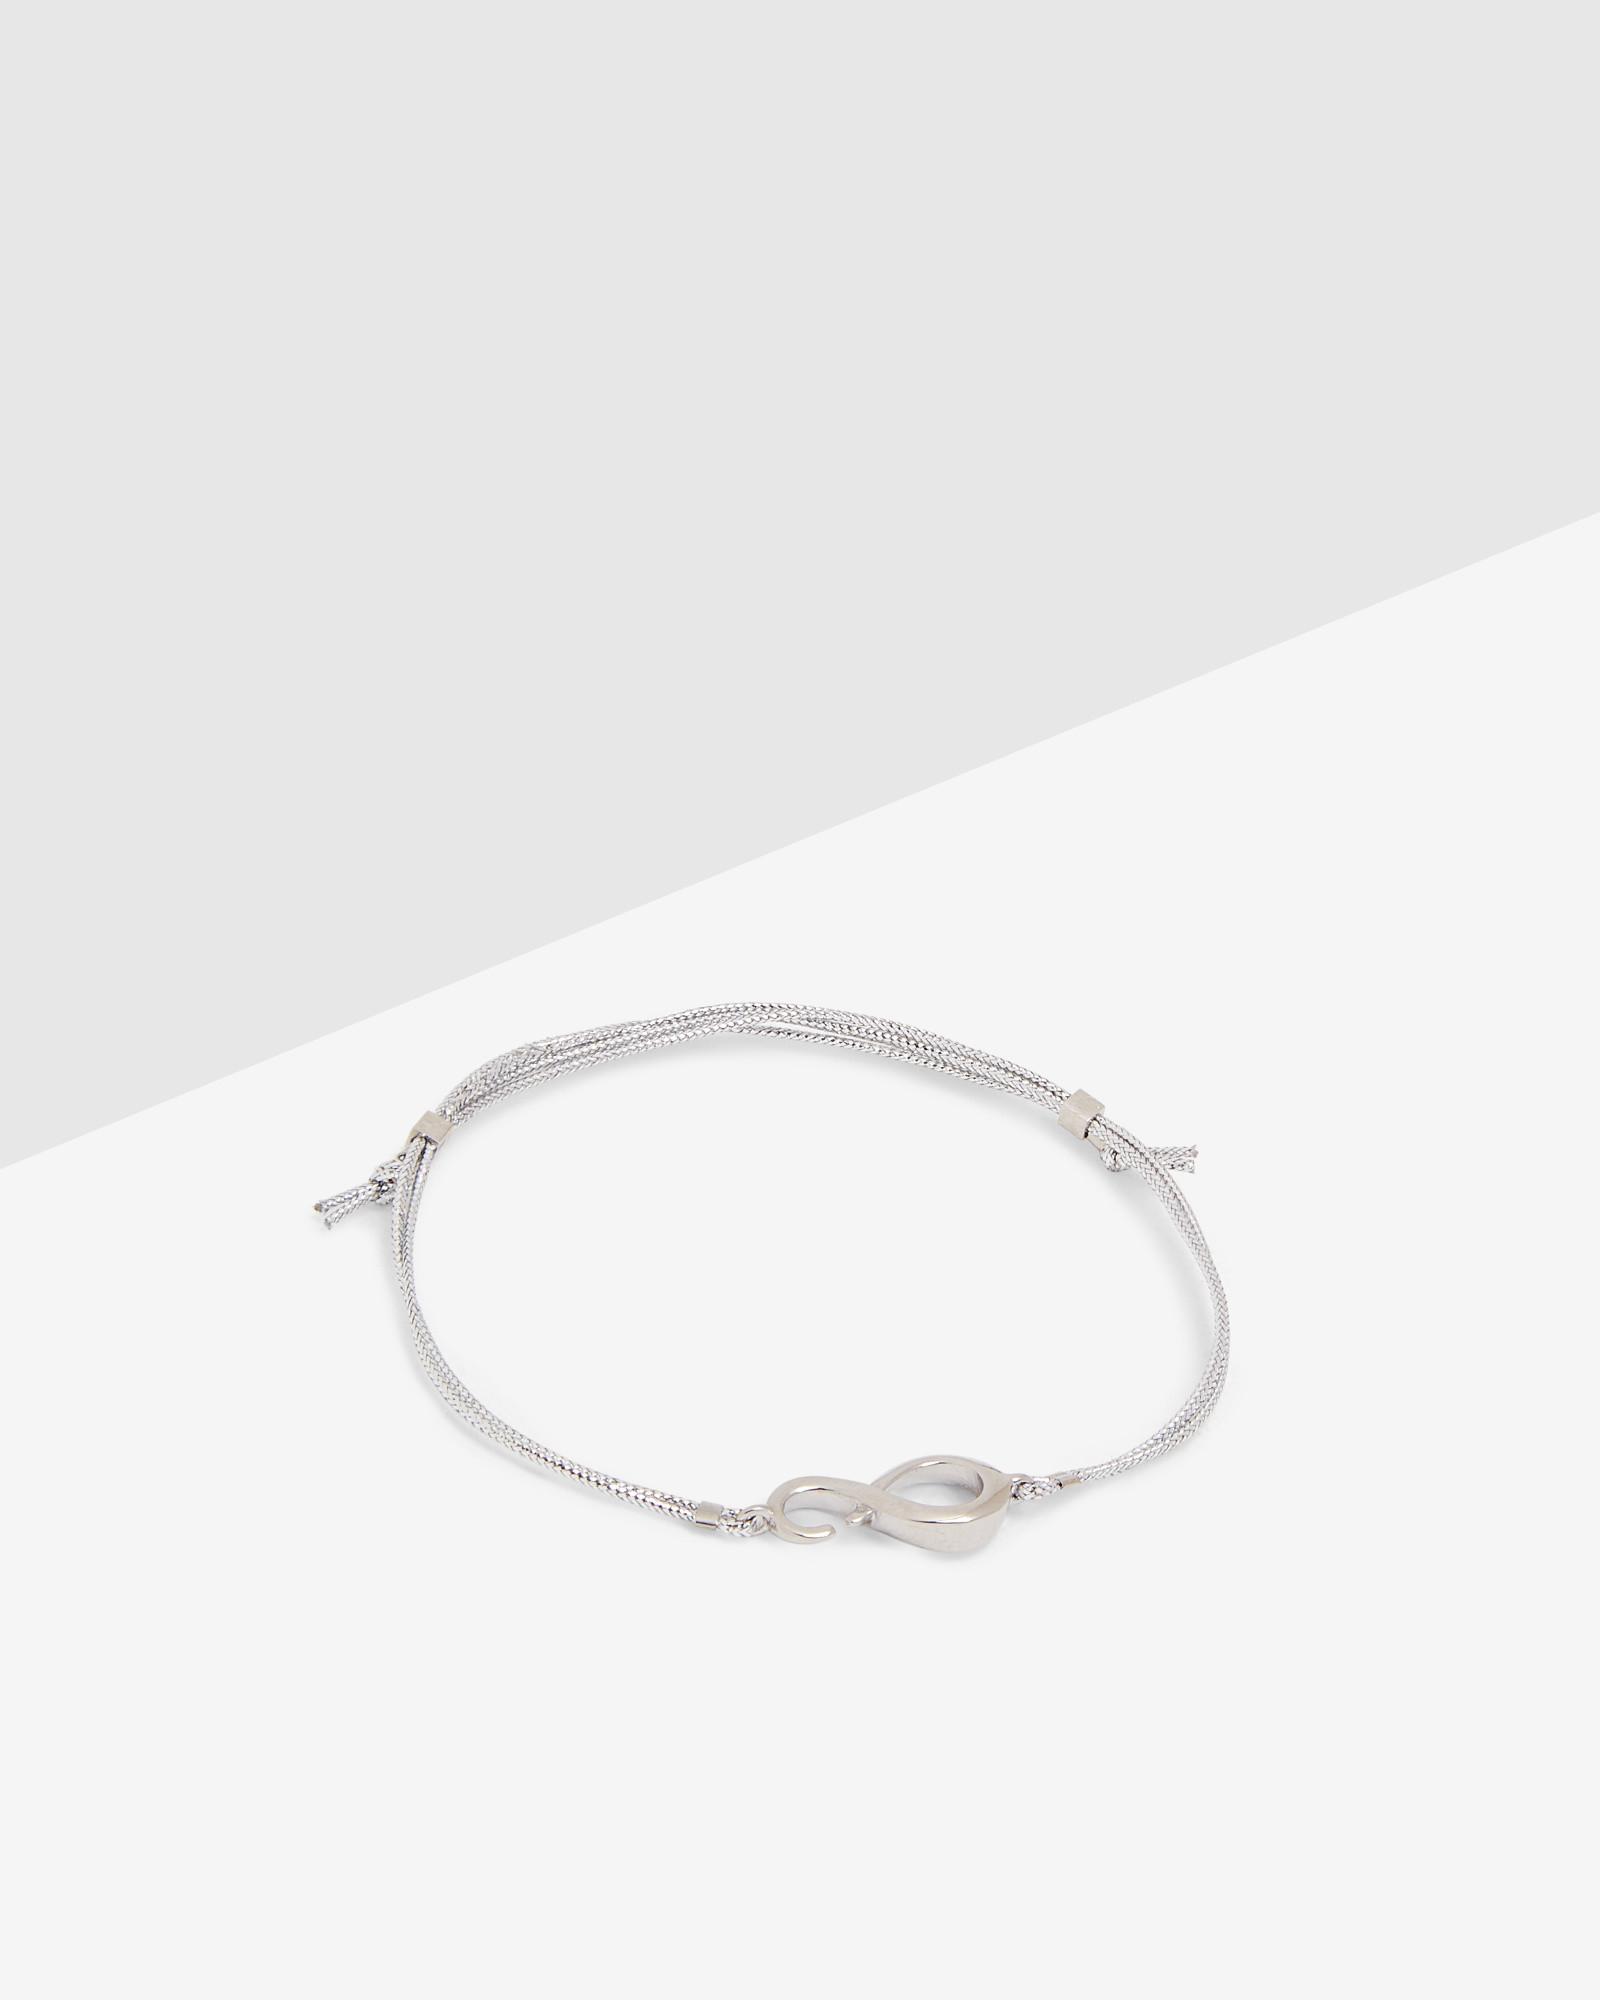 Ted Baker Infinity Cord Bracelet In